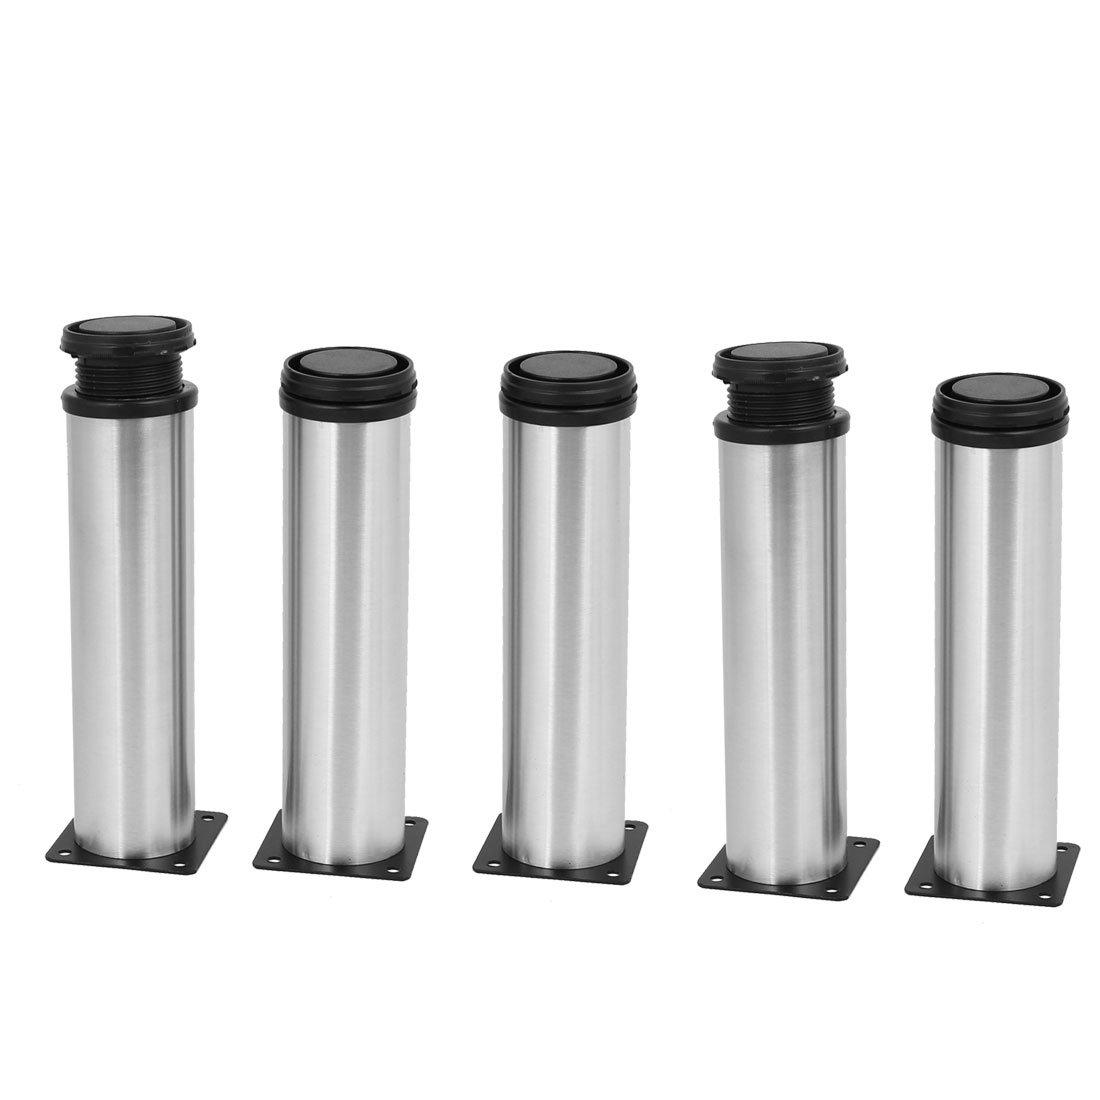 uxcell 50mm x 200mm Metal Adjustable Cabinet Sofa Feet Leg Round Stand 5PCS